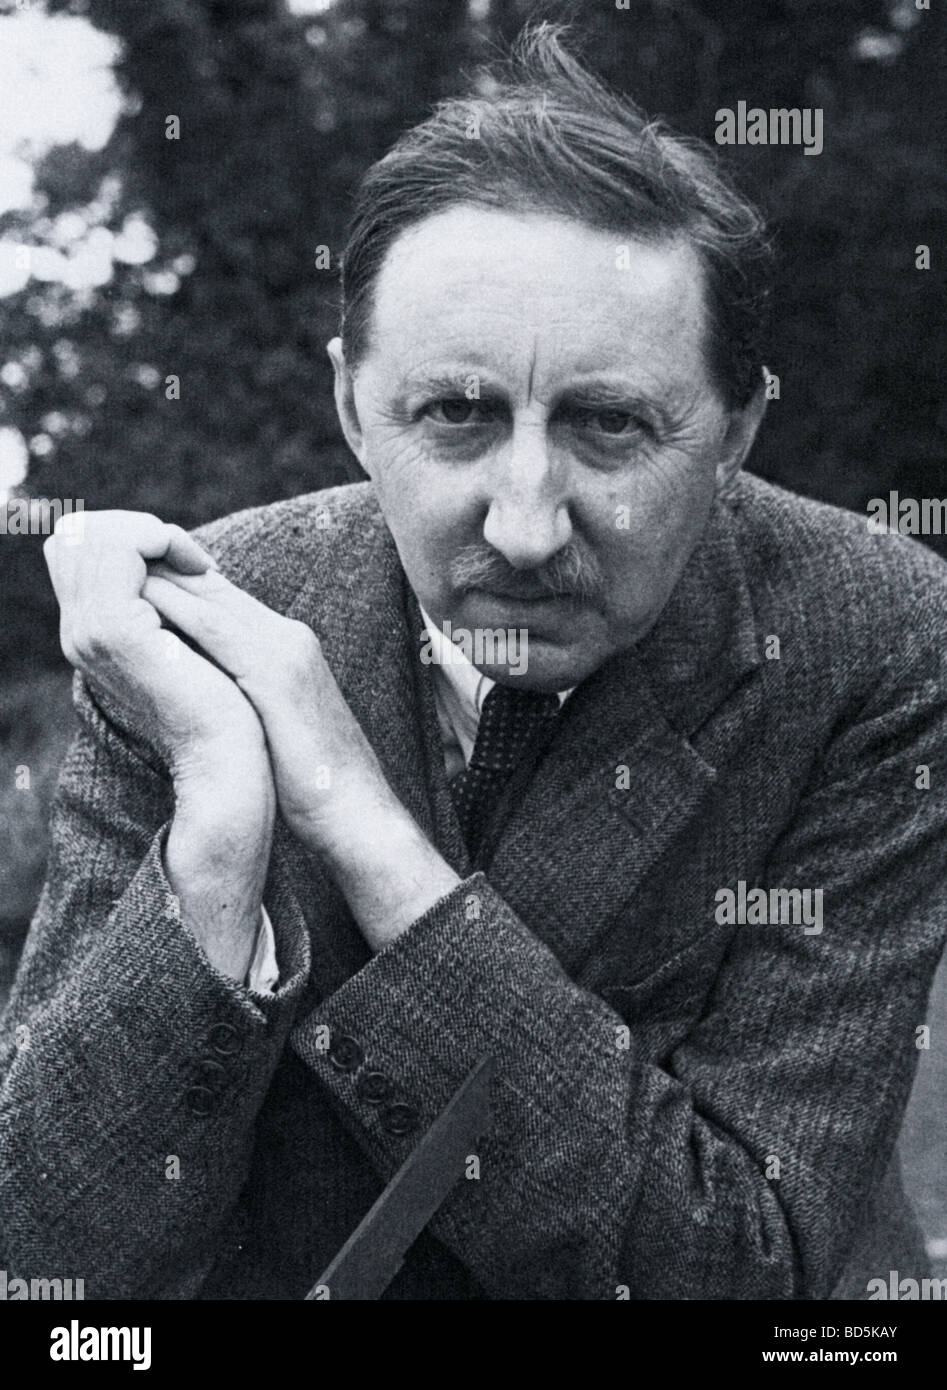 E M FORSTER British novelist in 1938 - Stock Image